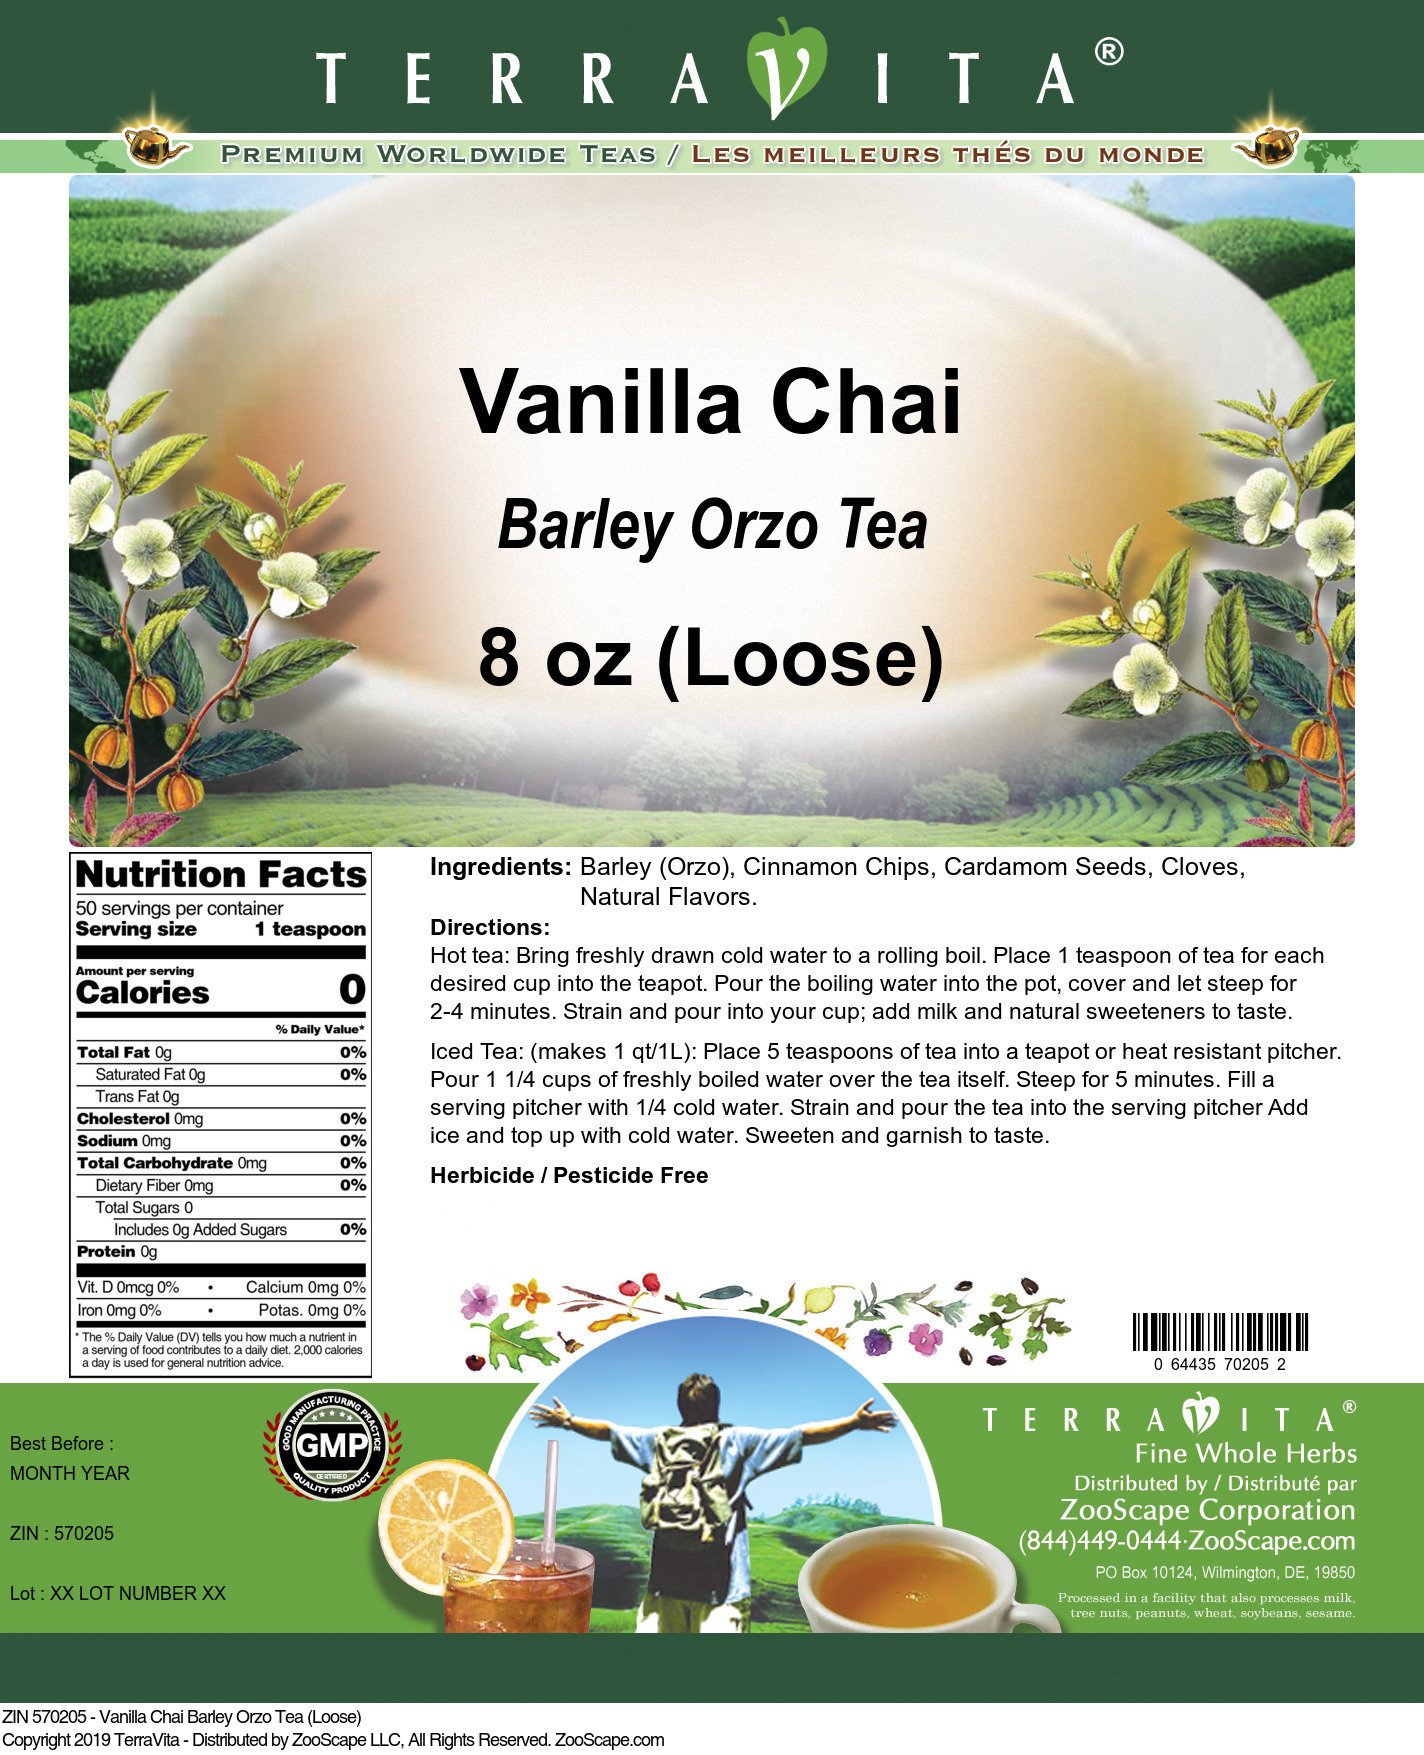 Vanilla Chai Barley Orzo